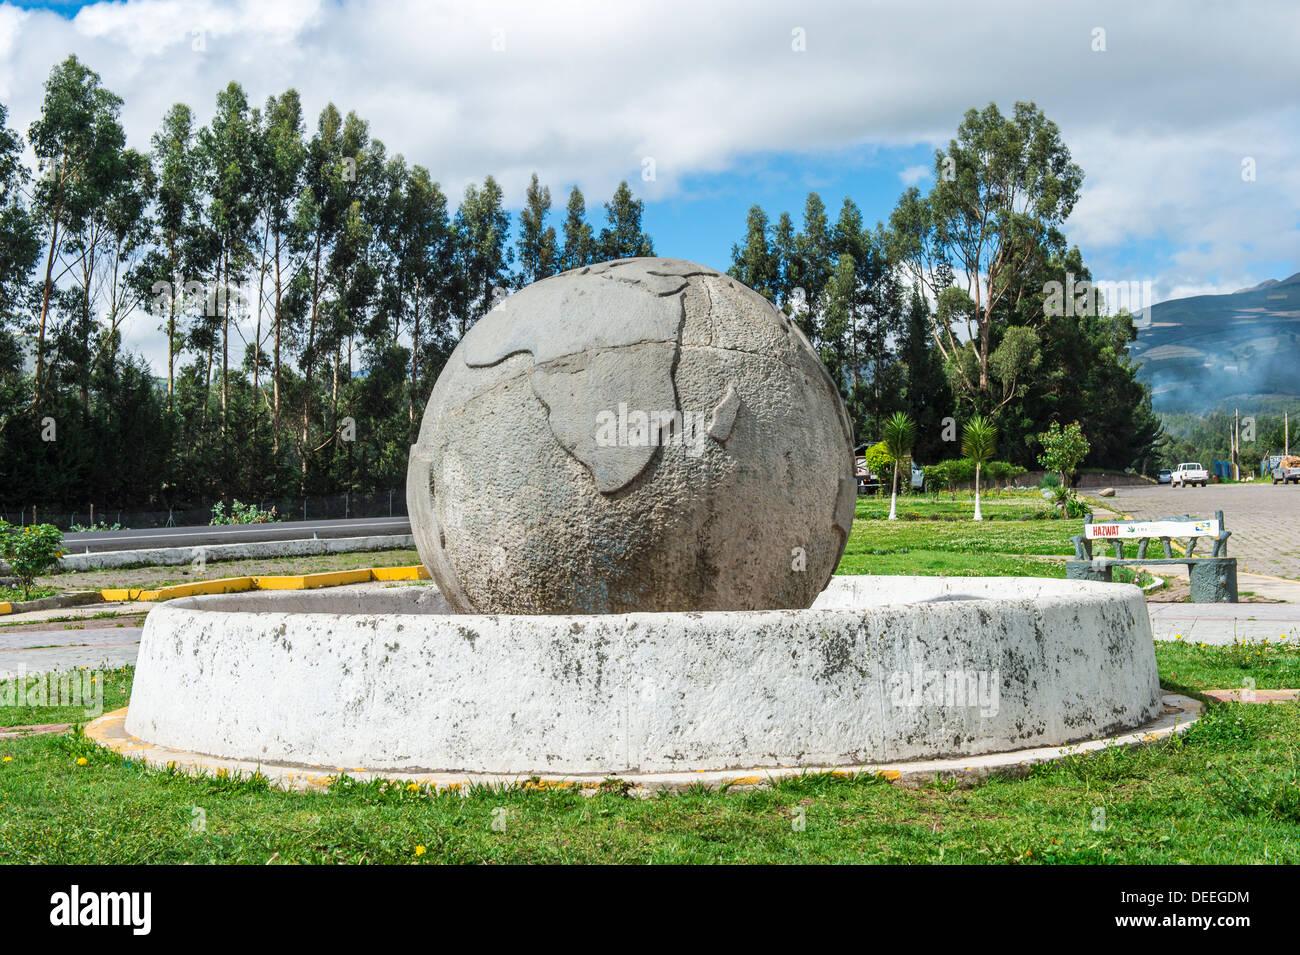 Equator line monument Guachala ball, Guachala, Pichincha Province, Ecuador, South America - Stock Image